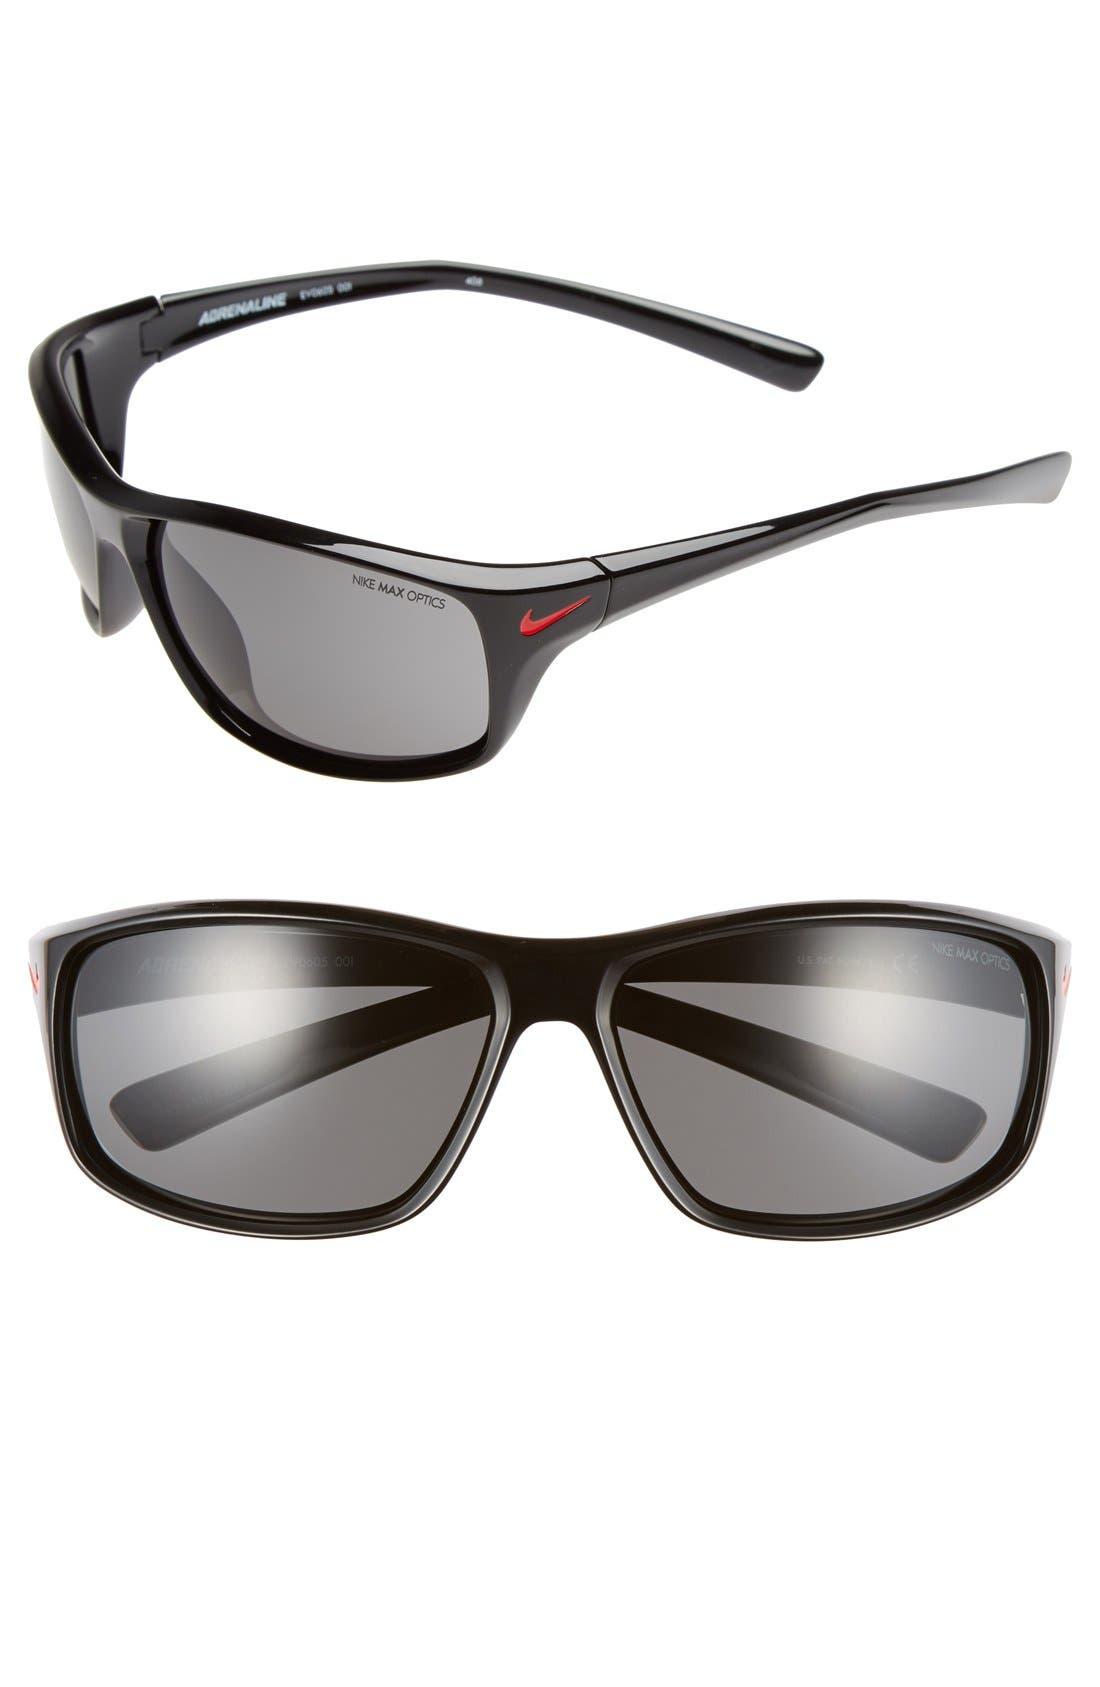 Nike 'Adrenaline' 64mm Sunglasses